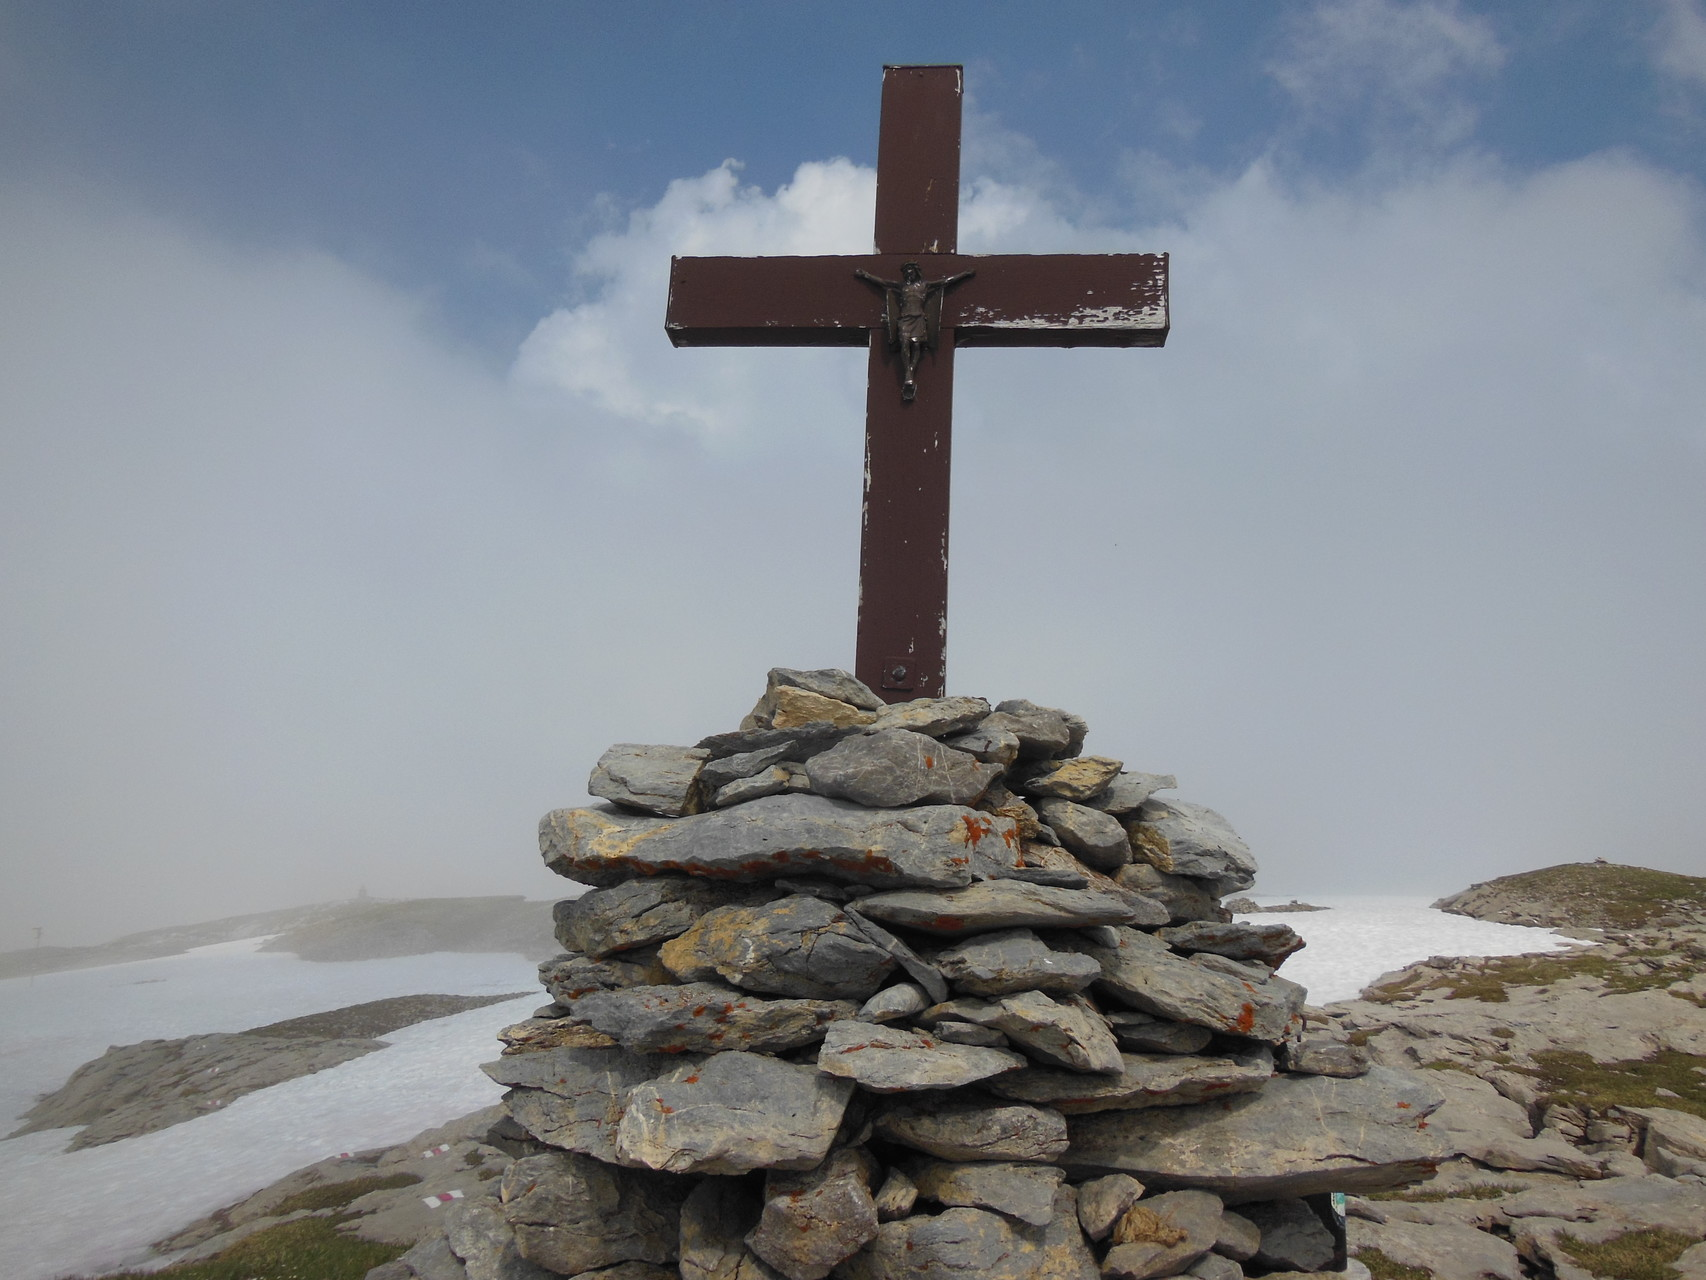 Gipfelkreuz Silberen (Twärenen)